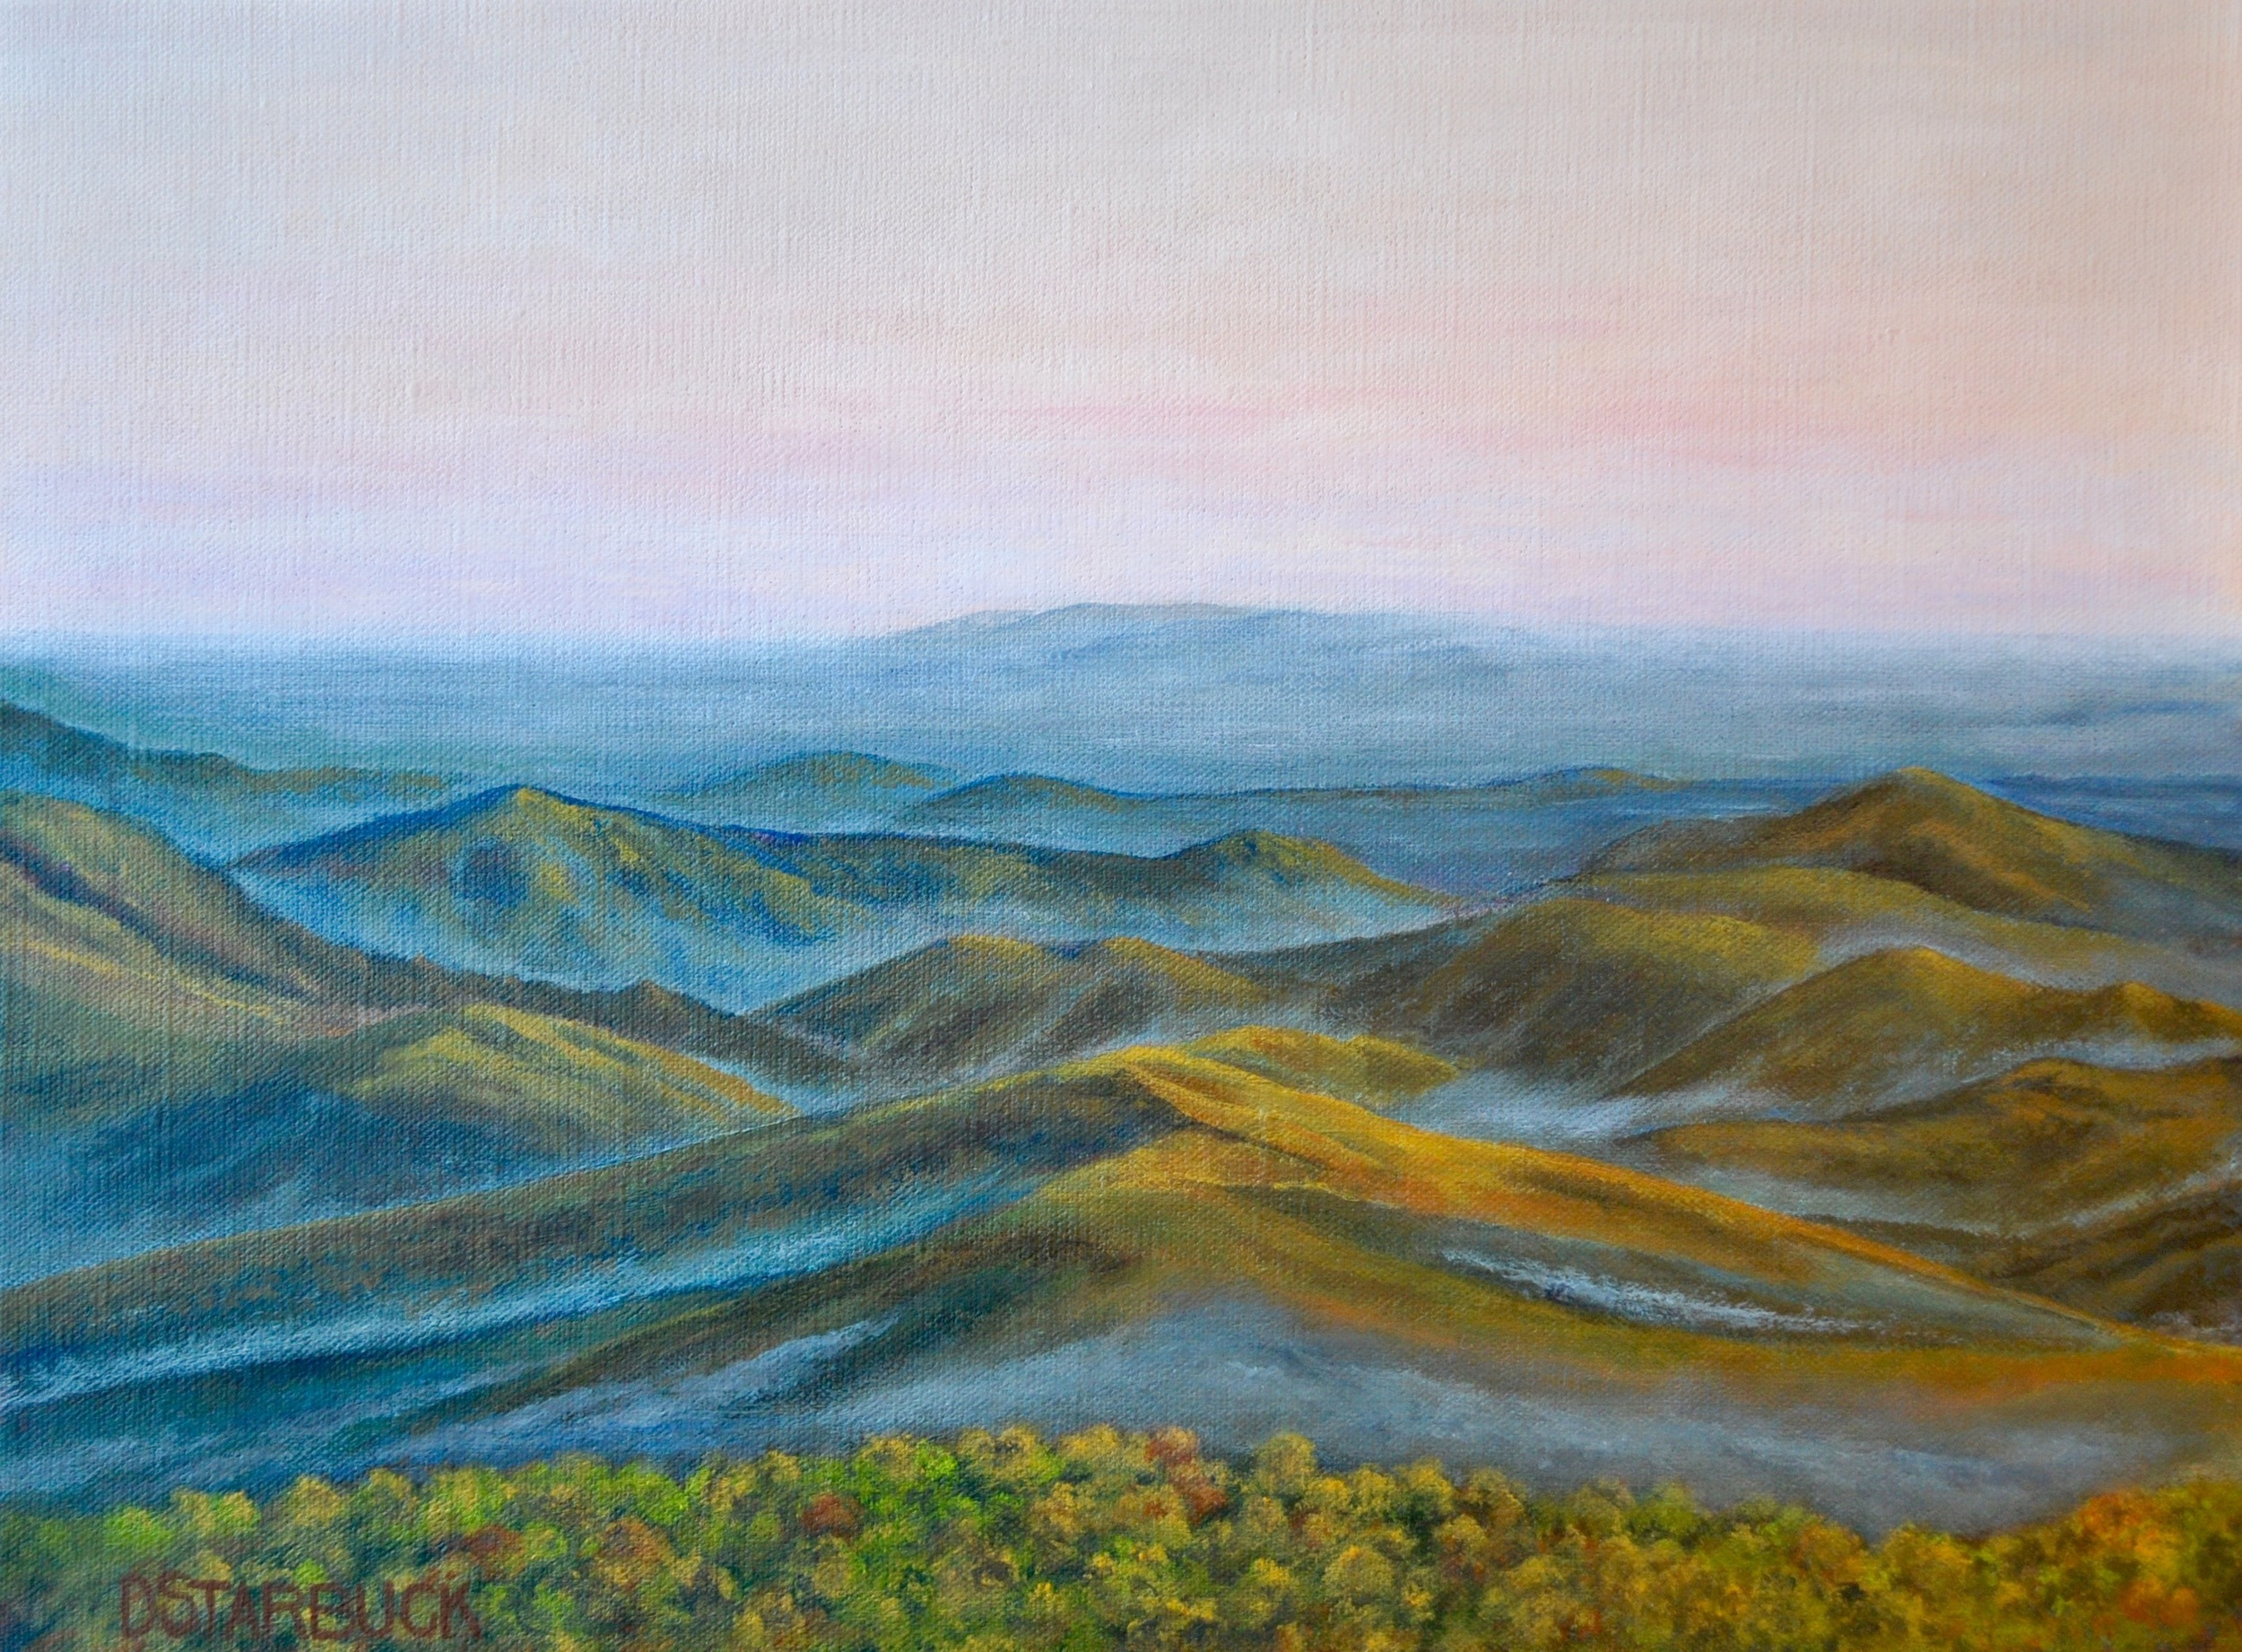 """Yadkin Valley Sundown"" Blue Ridge Parkway, North Carolina (SOLD)  Original: Acrylic on Linen, 16"" x 12"""